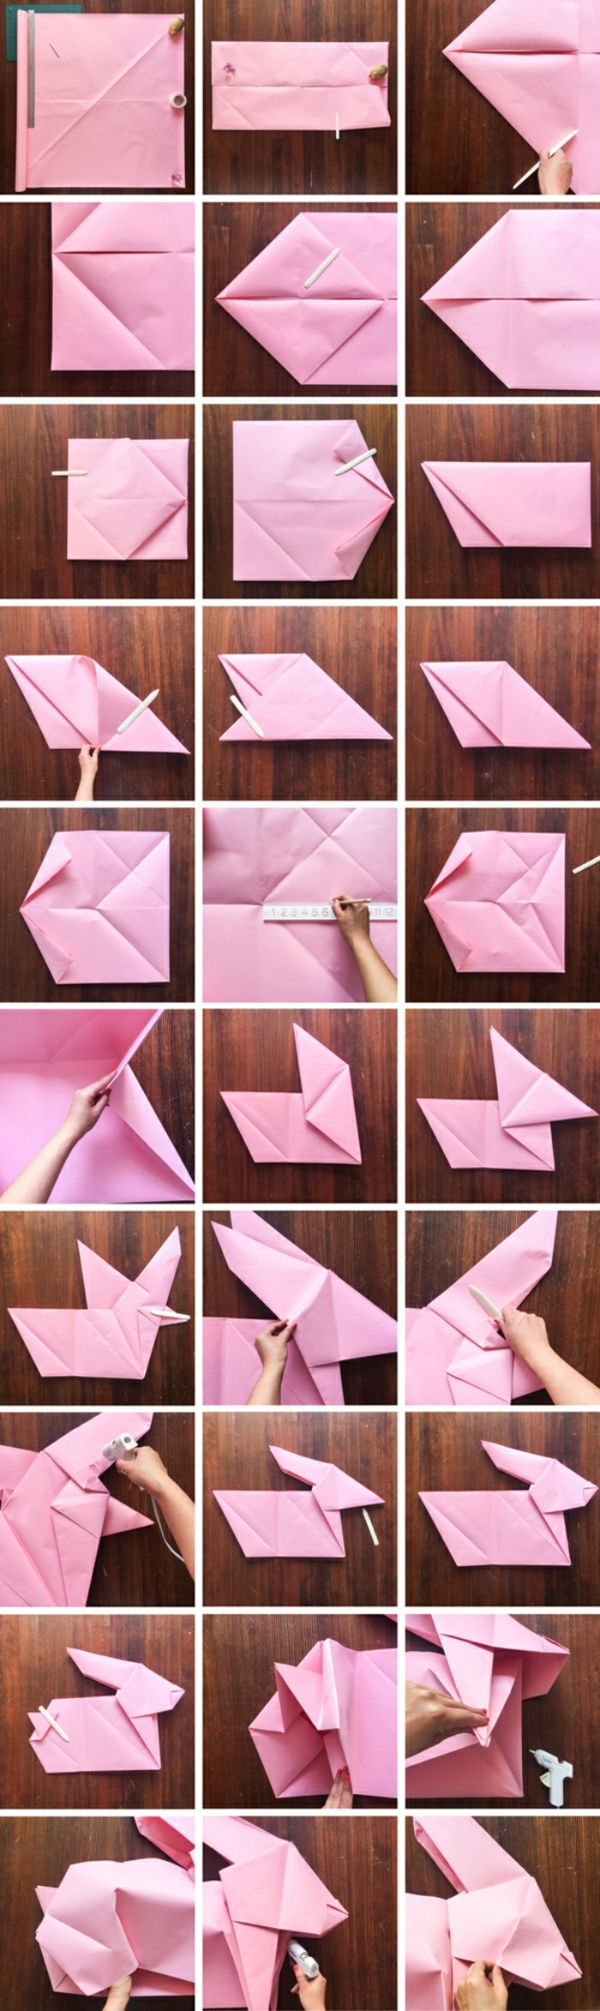 lapin de pâques origami diy technique